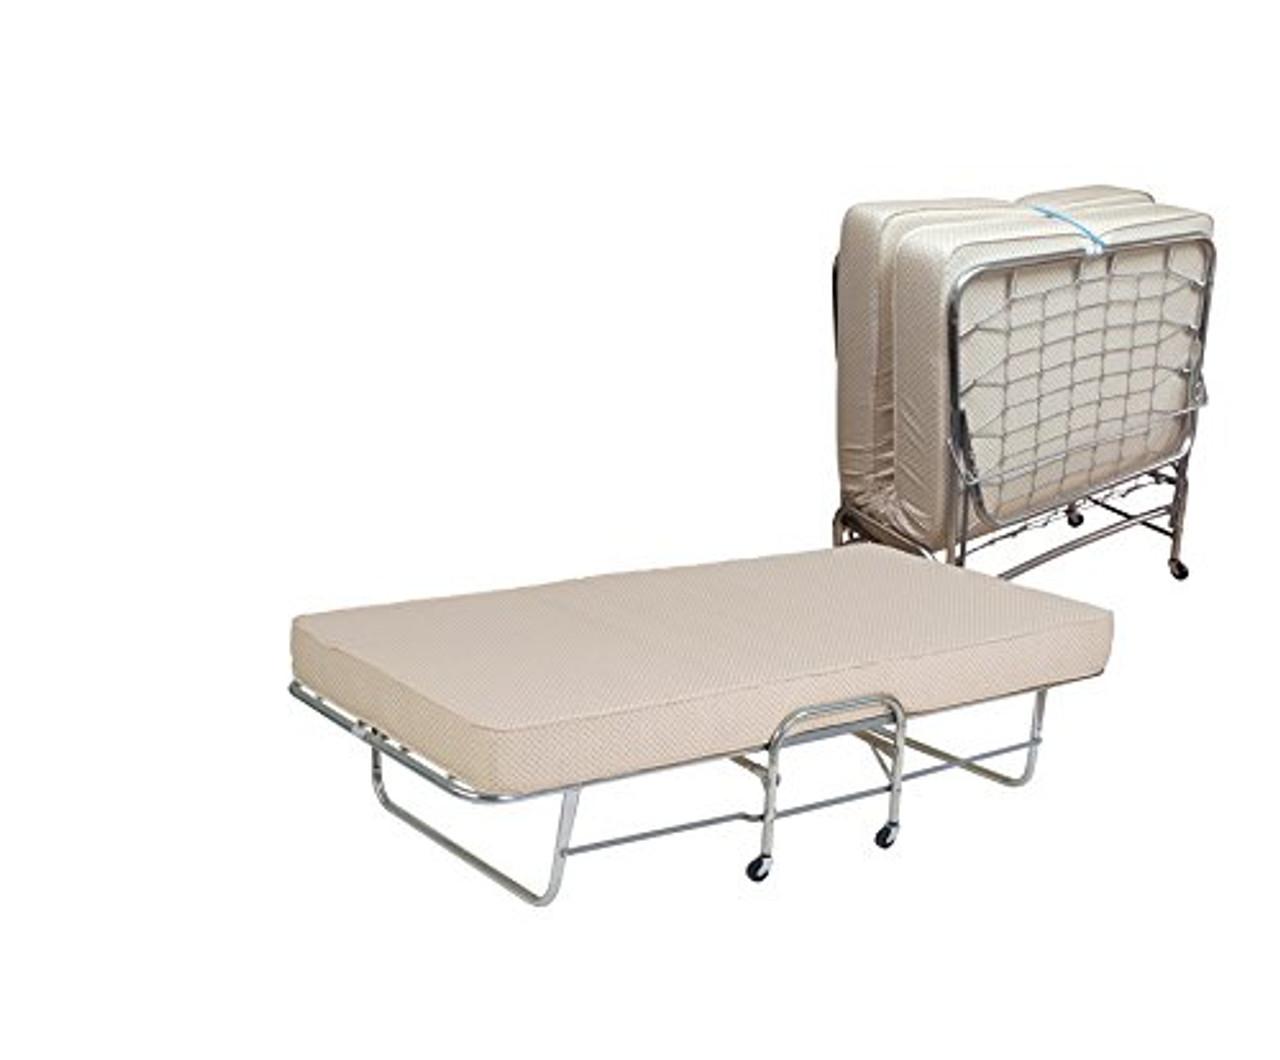 Picture of: Buy Mantua Rollaway Bed On Sale Near Houston Friendswood League City Starfine Furniture Mattress